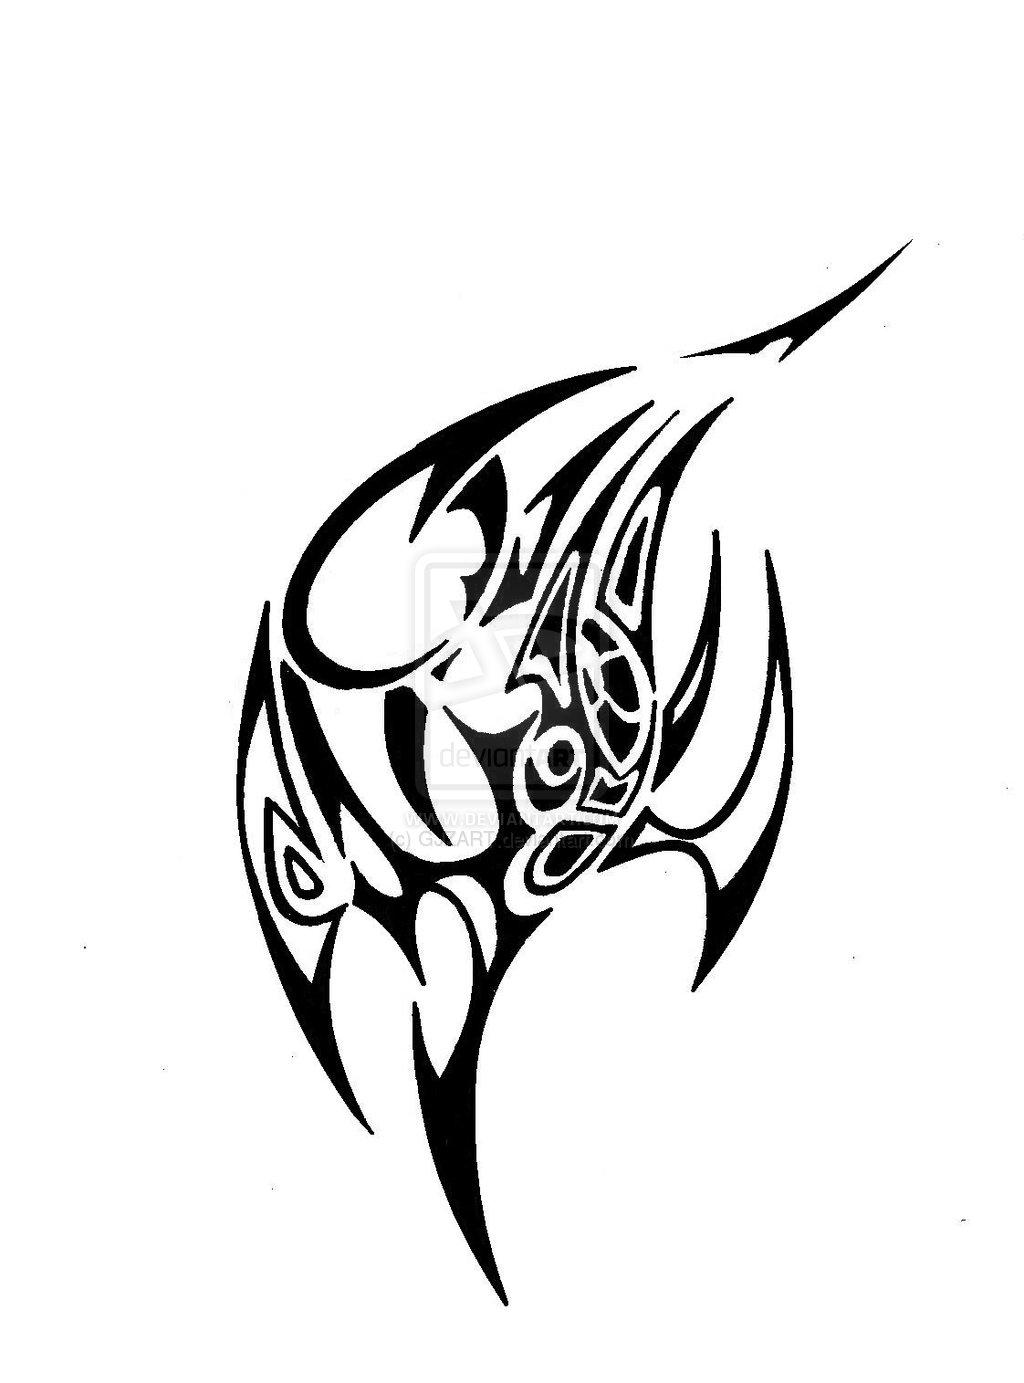 35 Ideas For Asymmetry Asymmetric Drawing